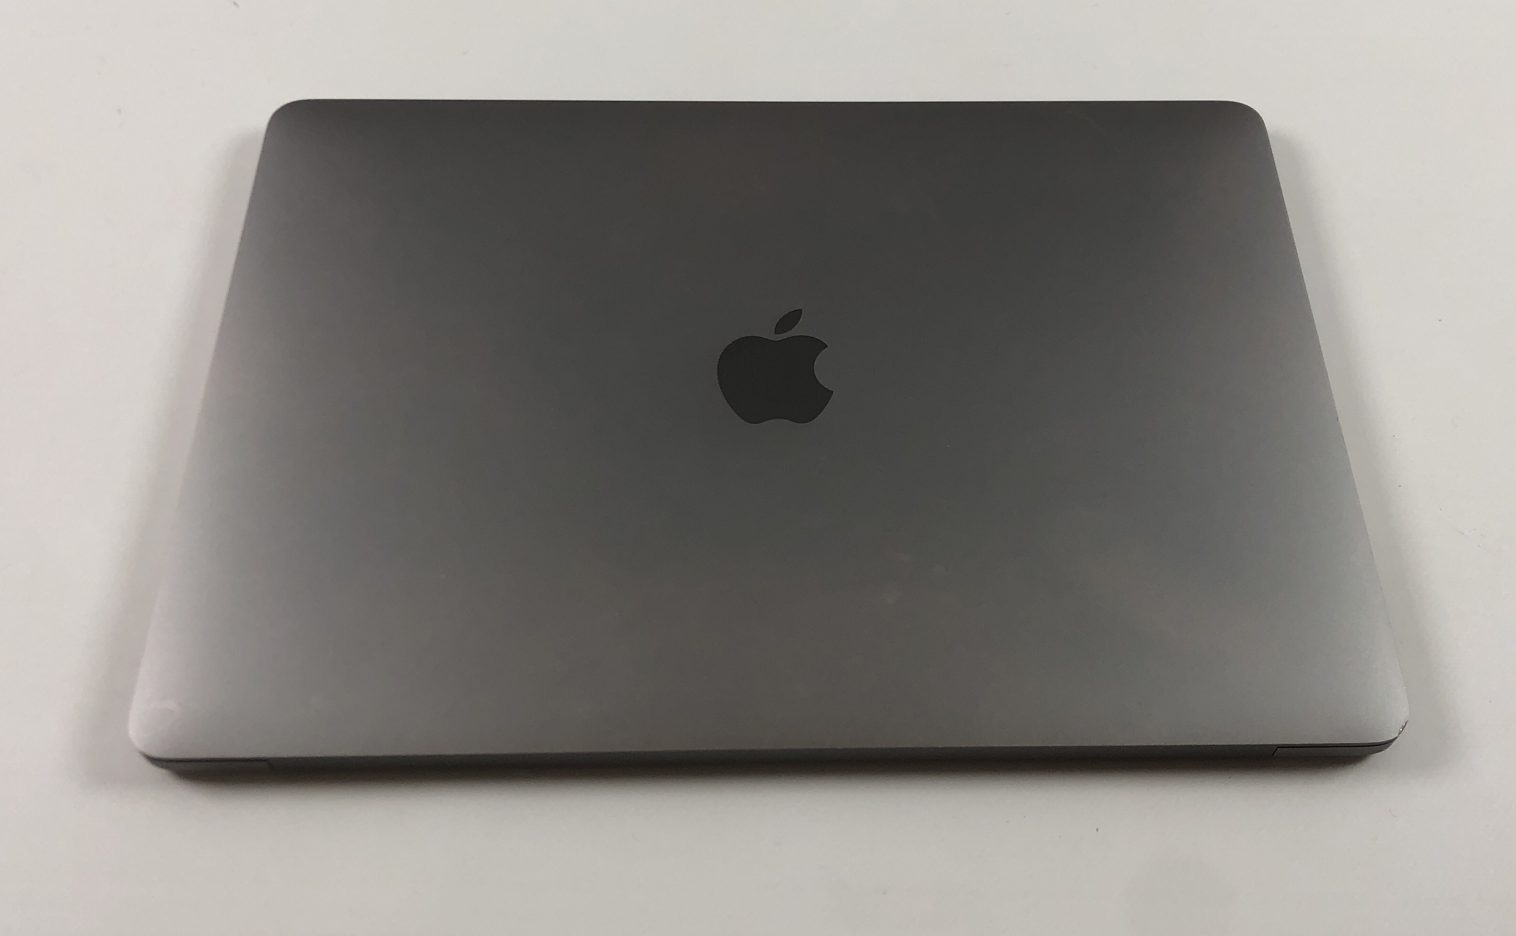 "MacBook Pro 13"" 4TBT Late 2016 (Intel Core i5 2.9 GHz 16 GB RAM 256 GB SSD), Space Gray, Intel Core i5 2.9 GHz, 16 GB RAM, 256 GB SSD, imagen 2"